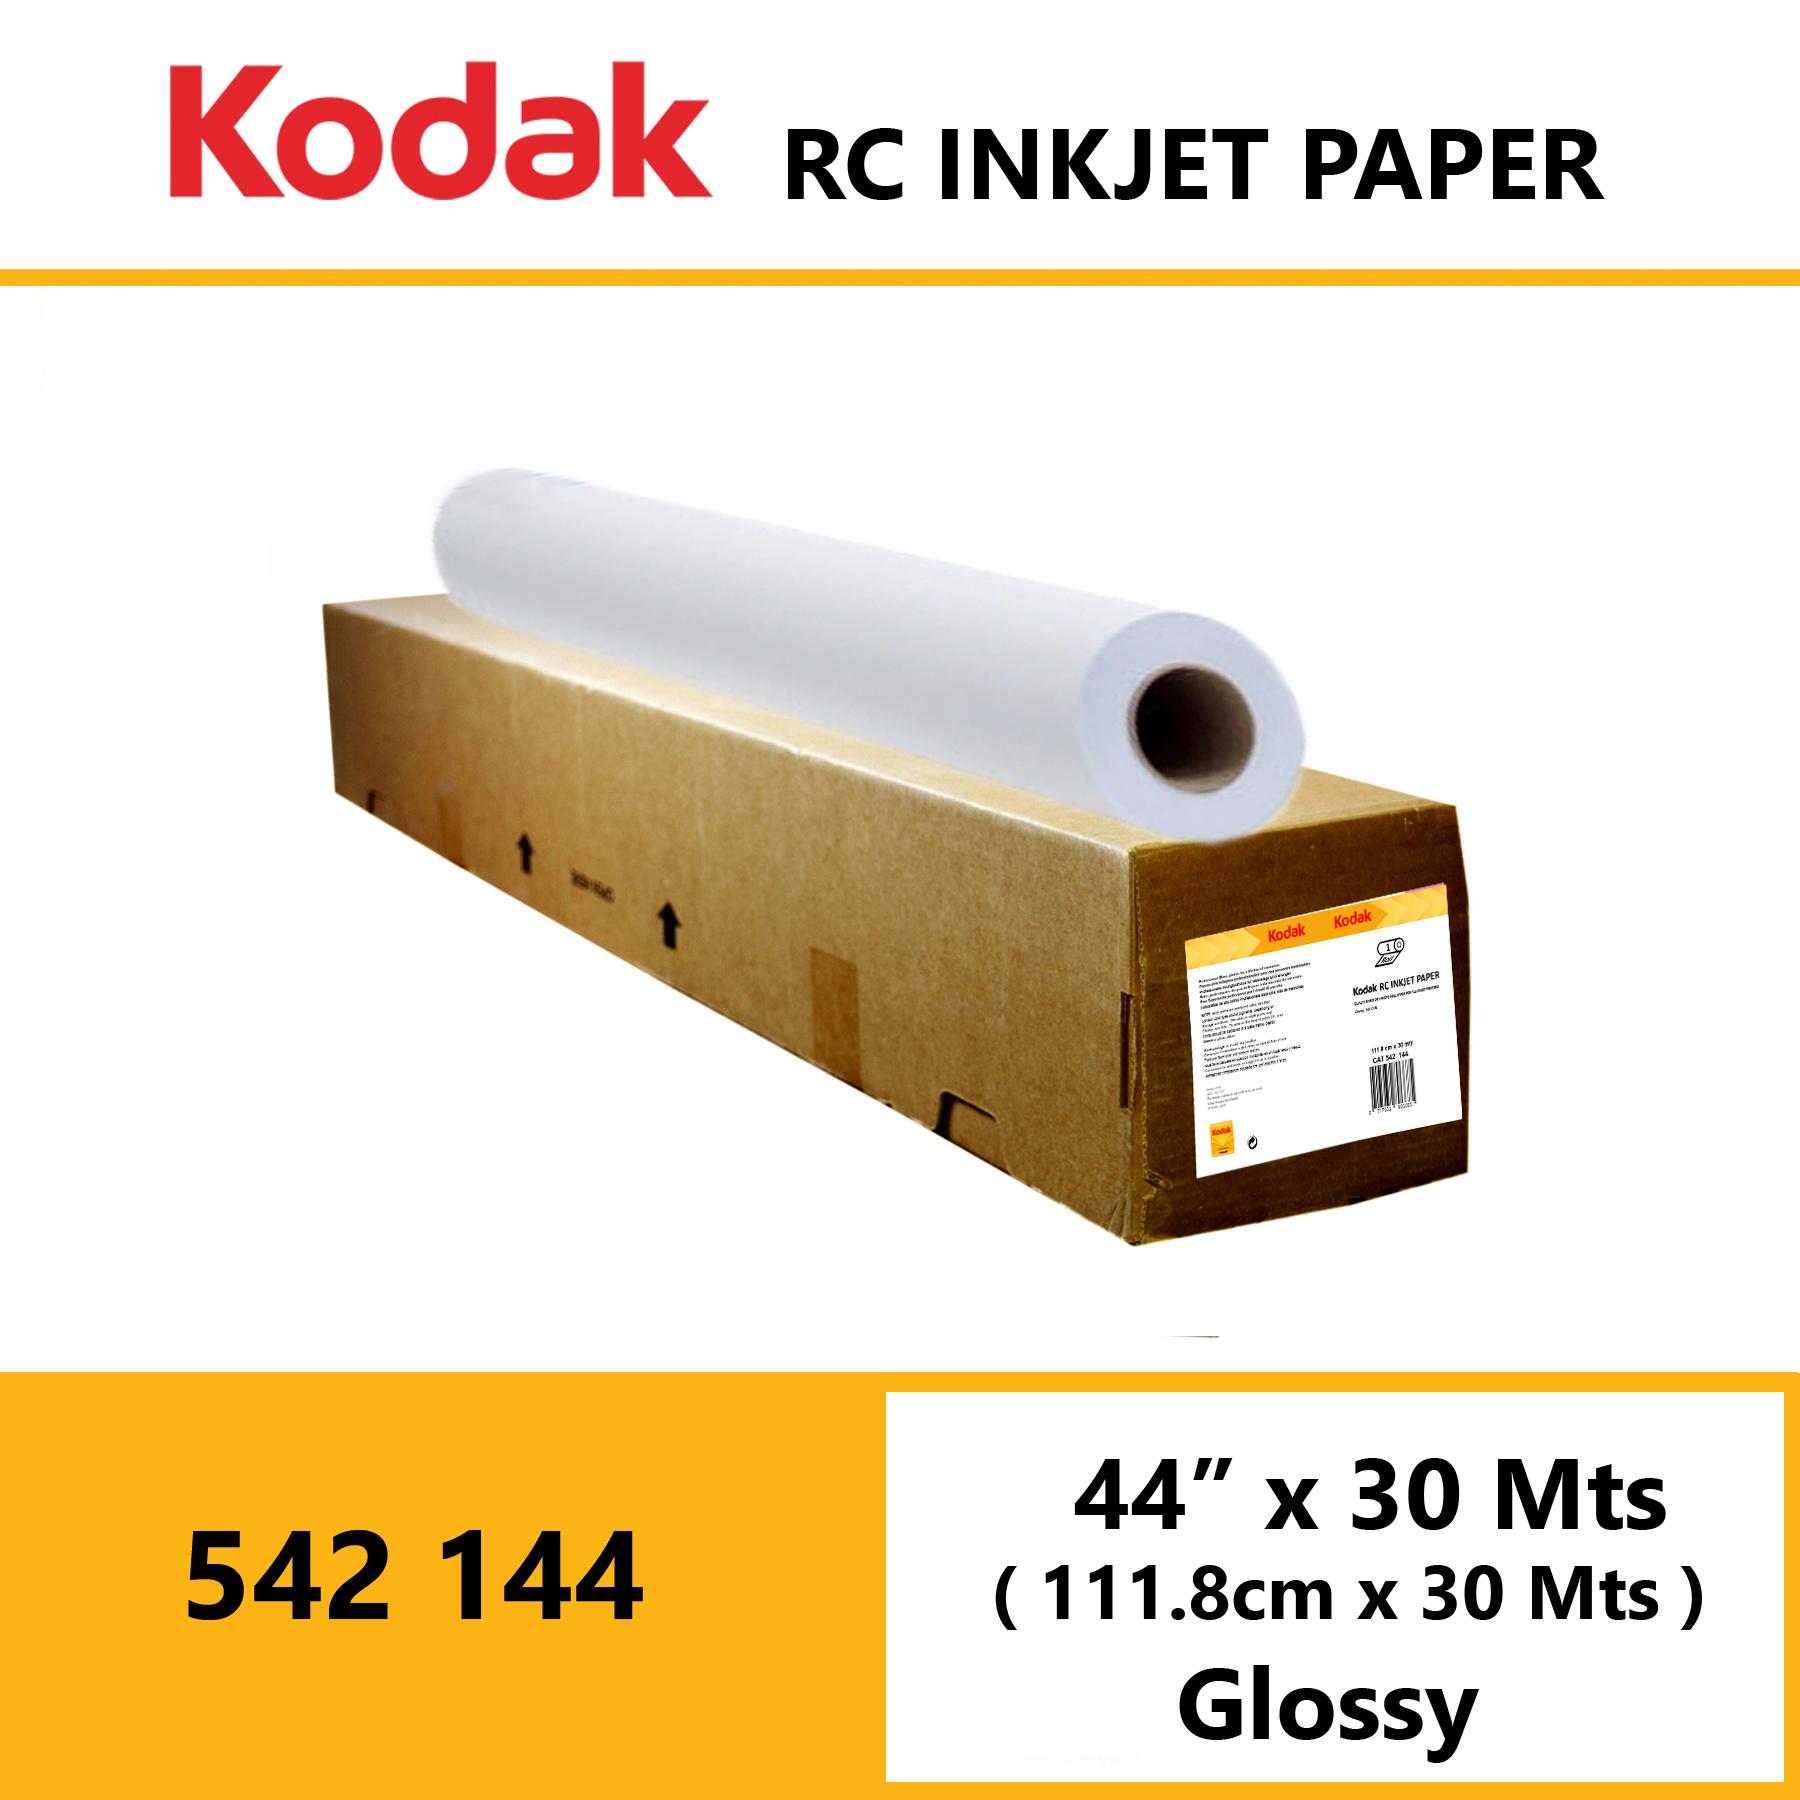 "Kodak Inkjet RC Paper 44"" x 30 Mtrs Glossy"